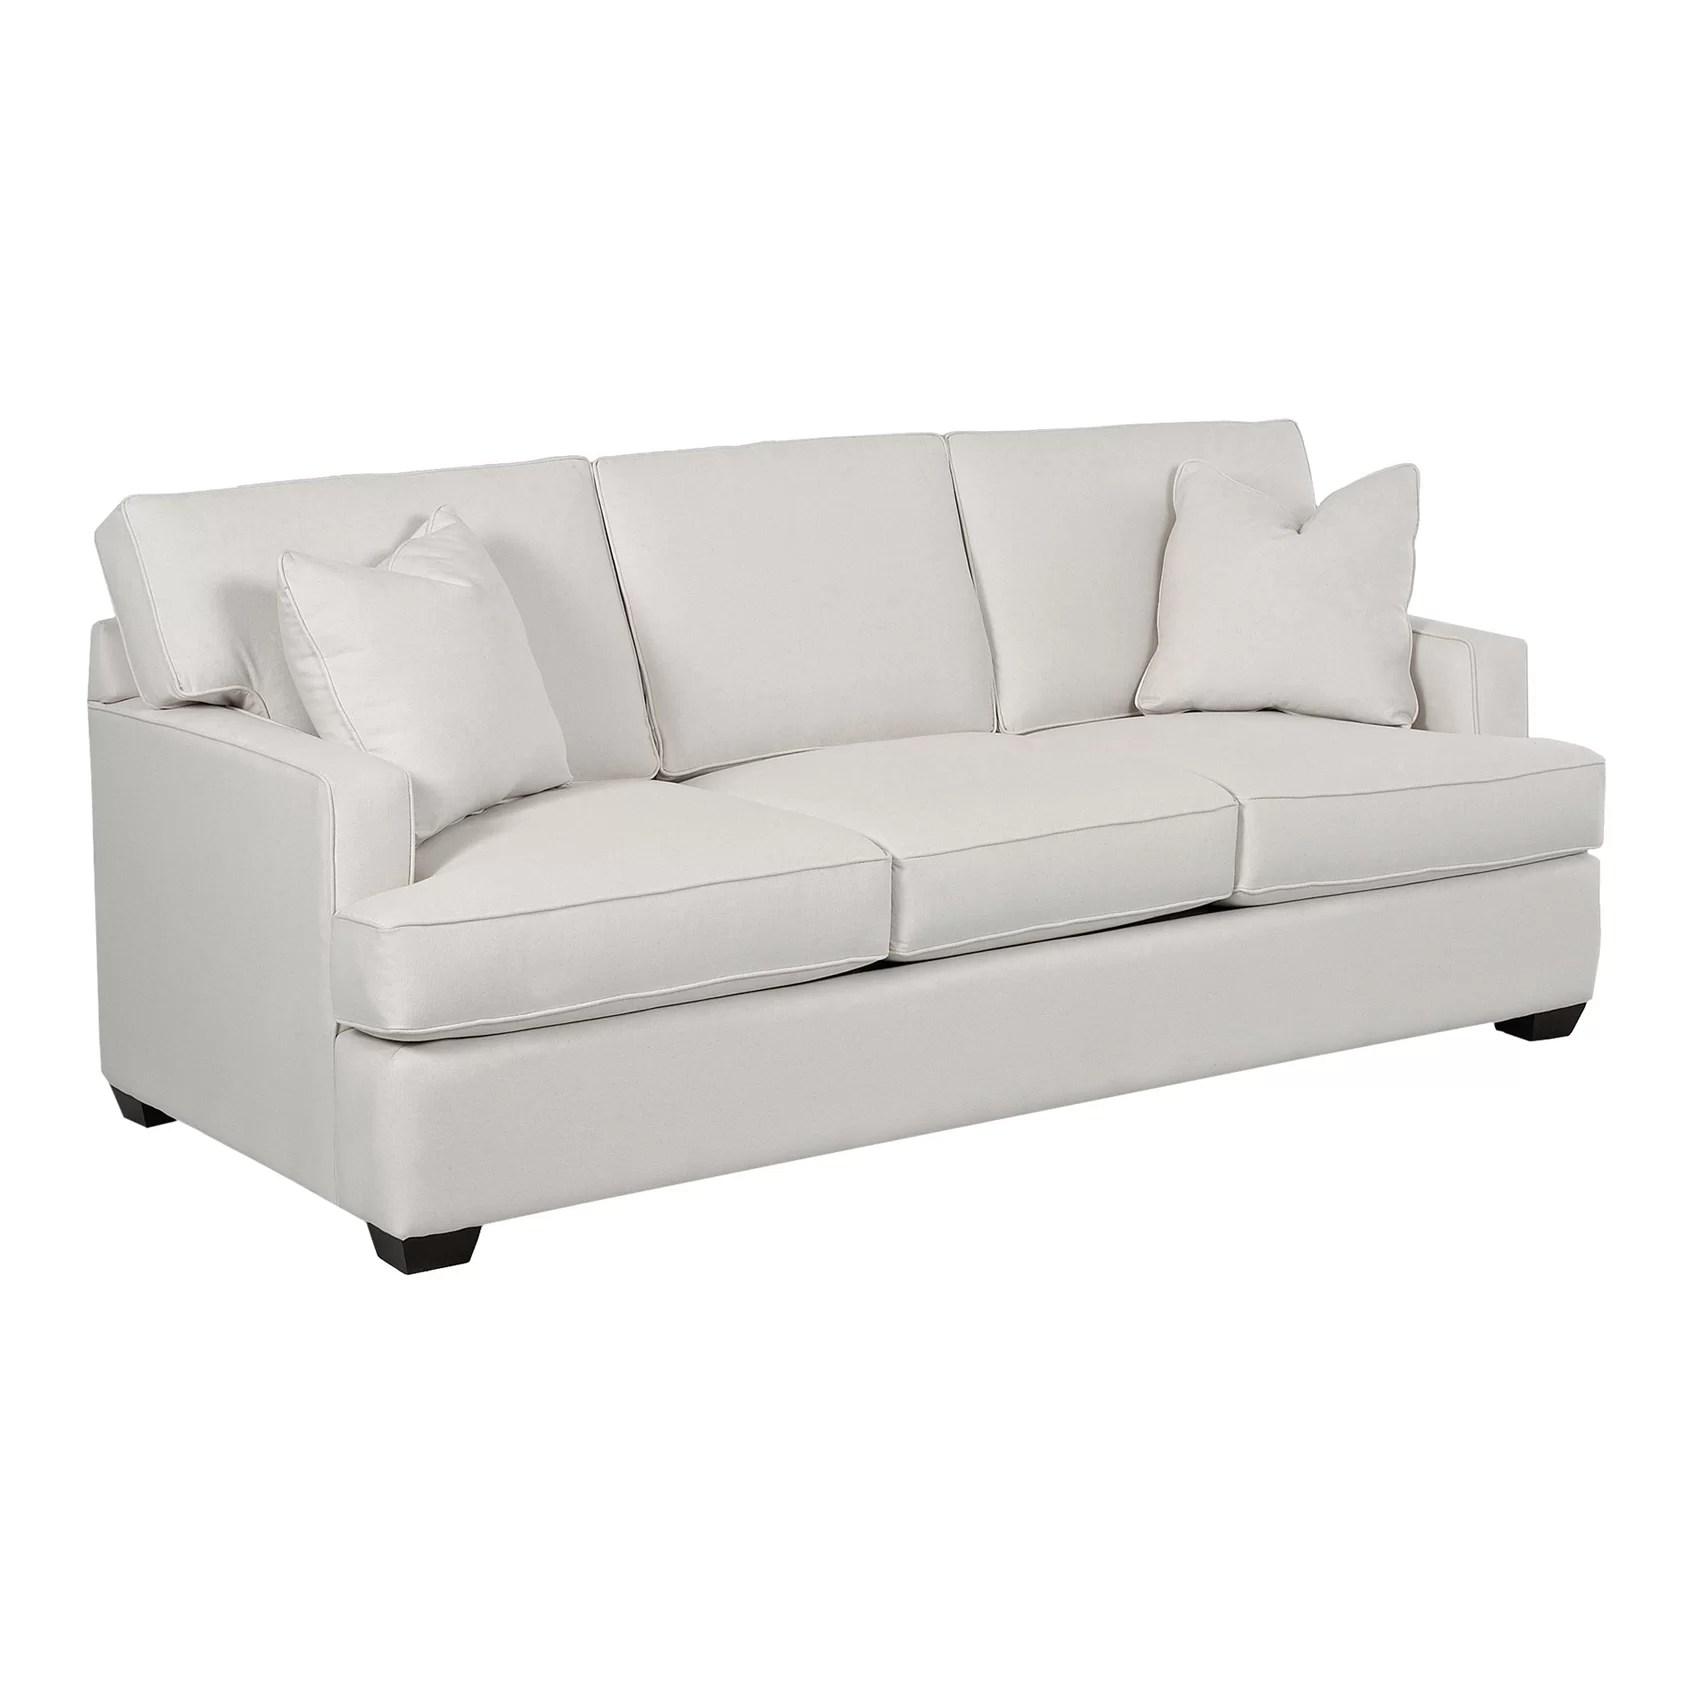 sofas at wayfair billy sofa custom upholstery avery and reviews